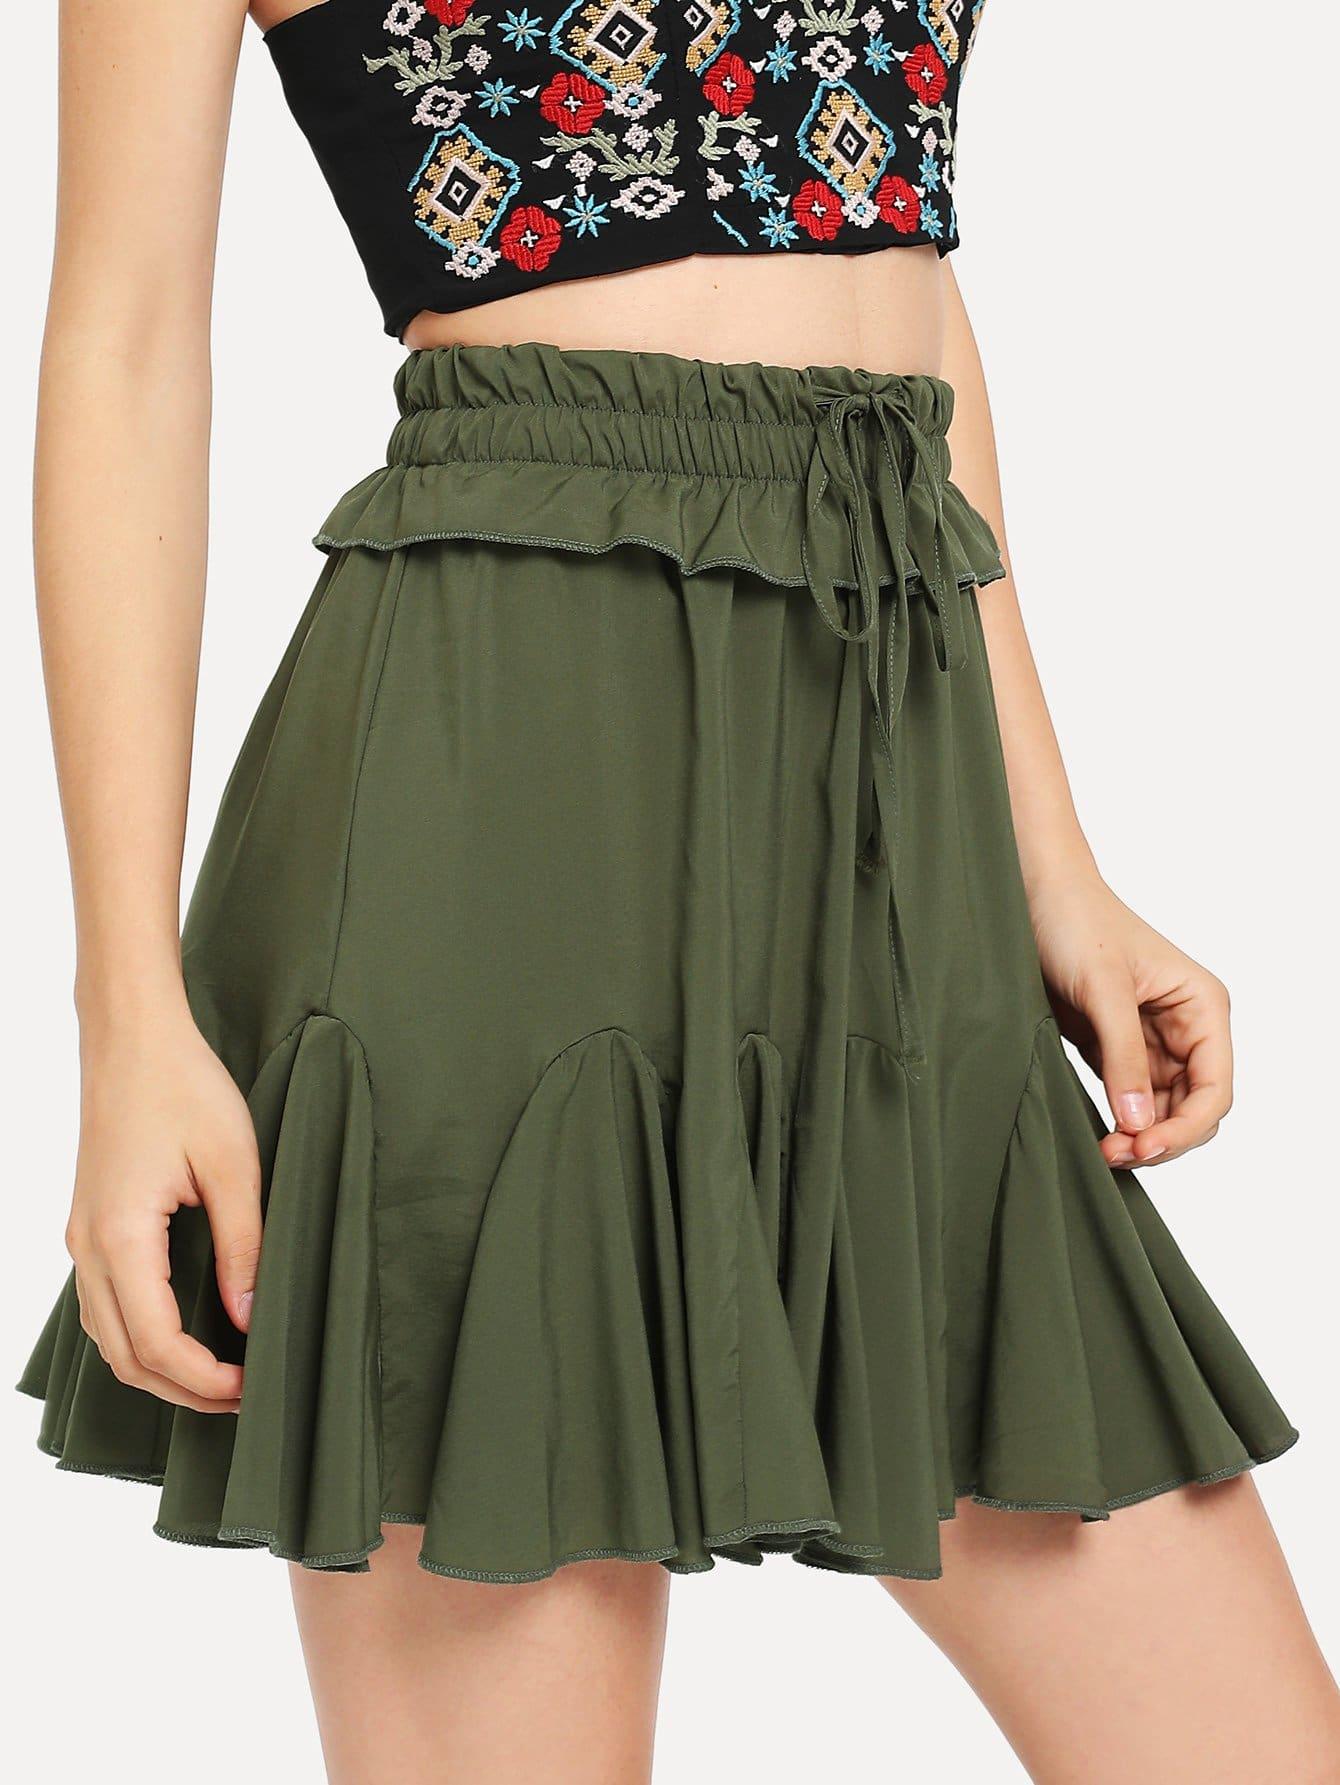 Drawstring Waist Ruffle Skirt plus size ruffle drawstring waist gaucho pants